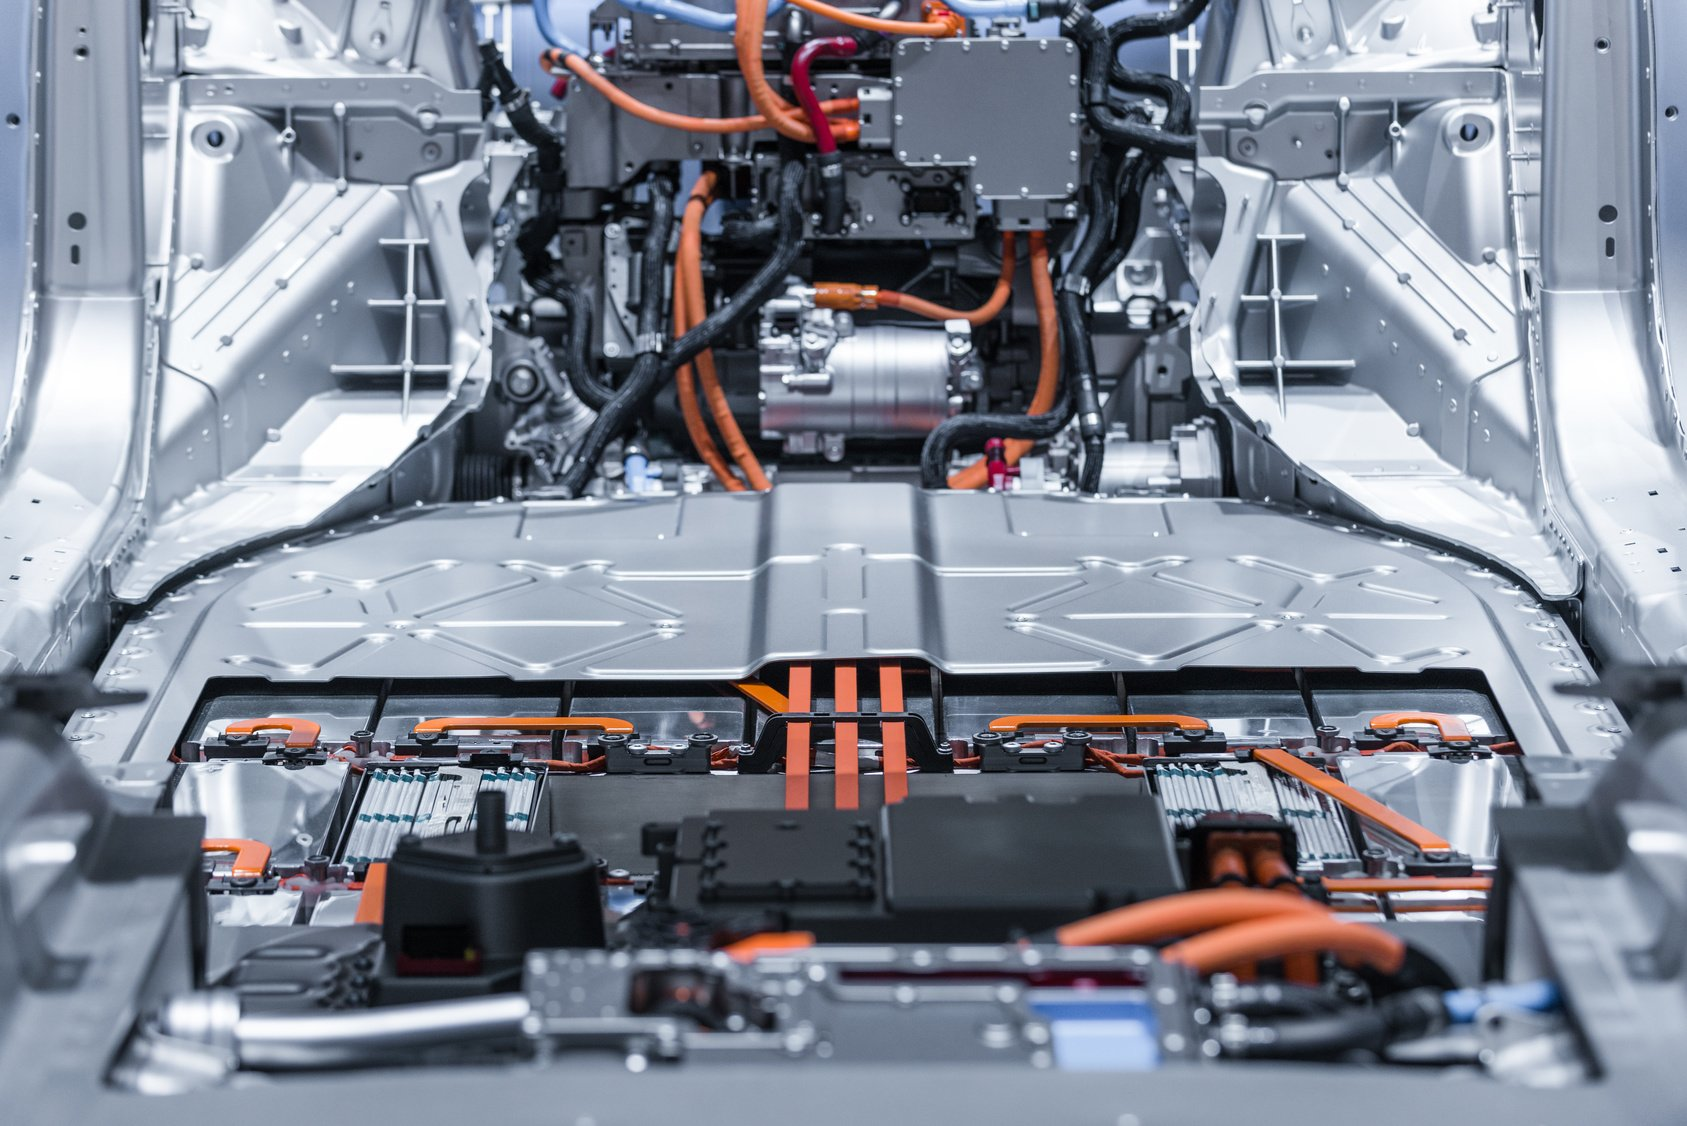 Steuerberater für Automotive - Elektro - Sensorik - Messtechnik